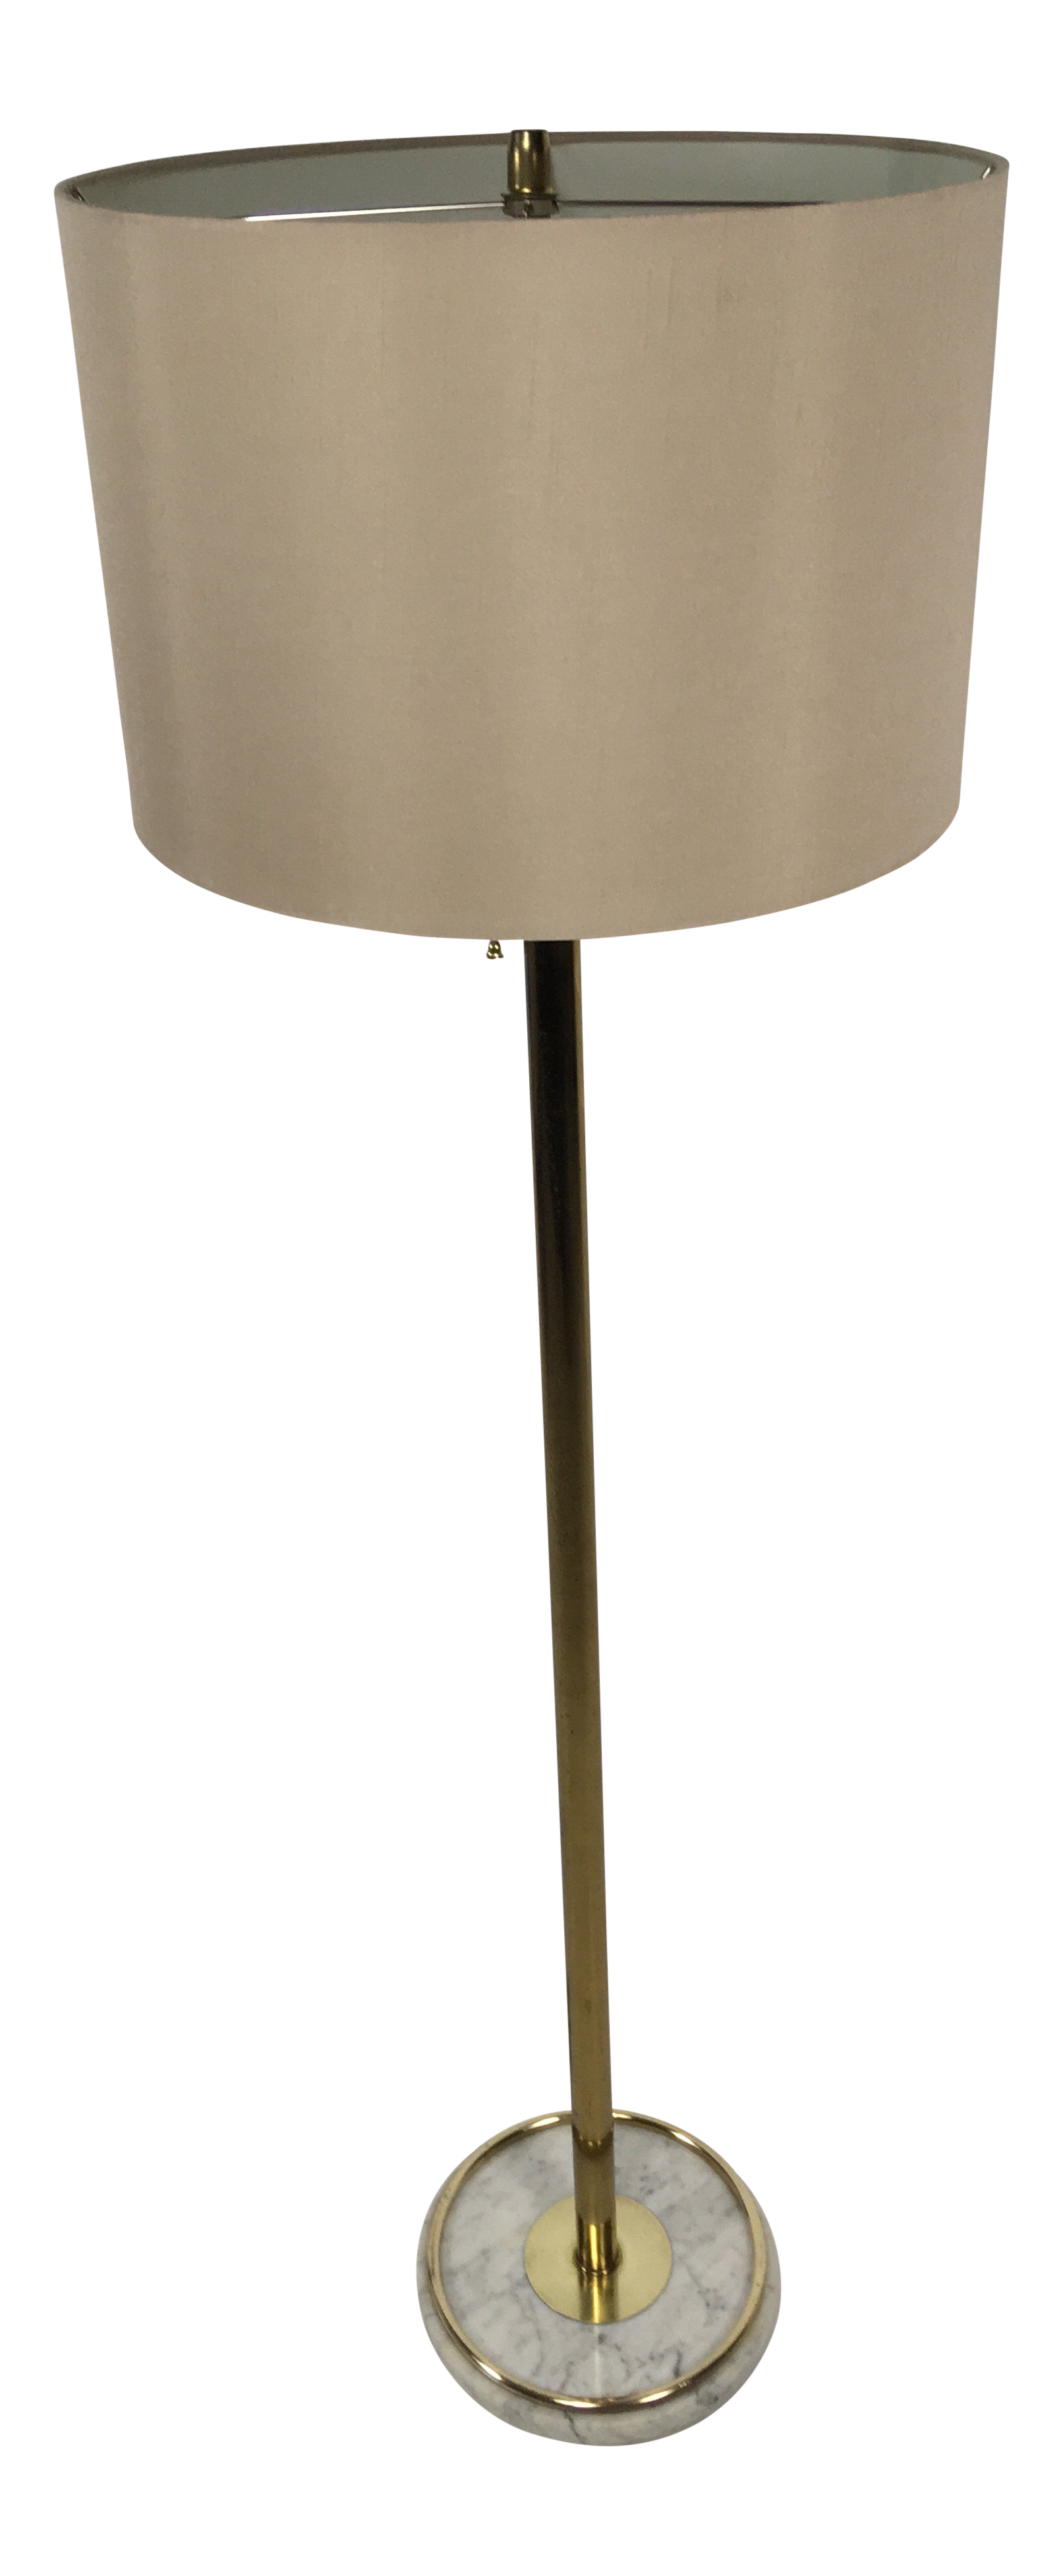 Mid Century Brass And Marble Floor Lamp